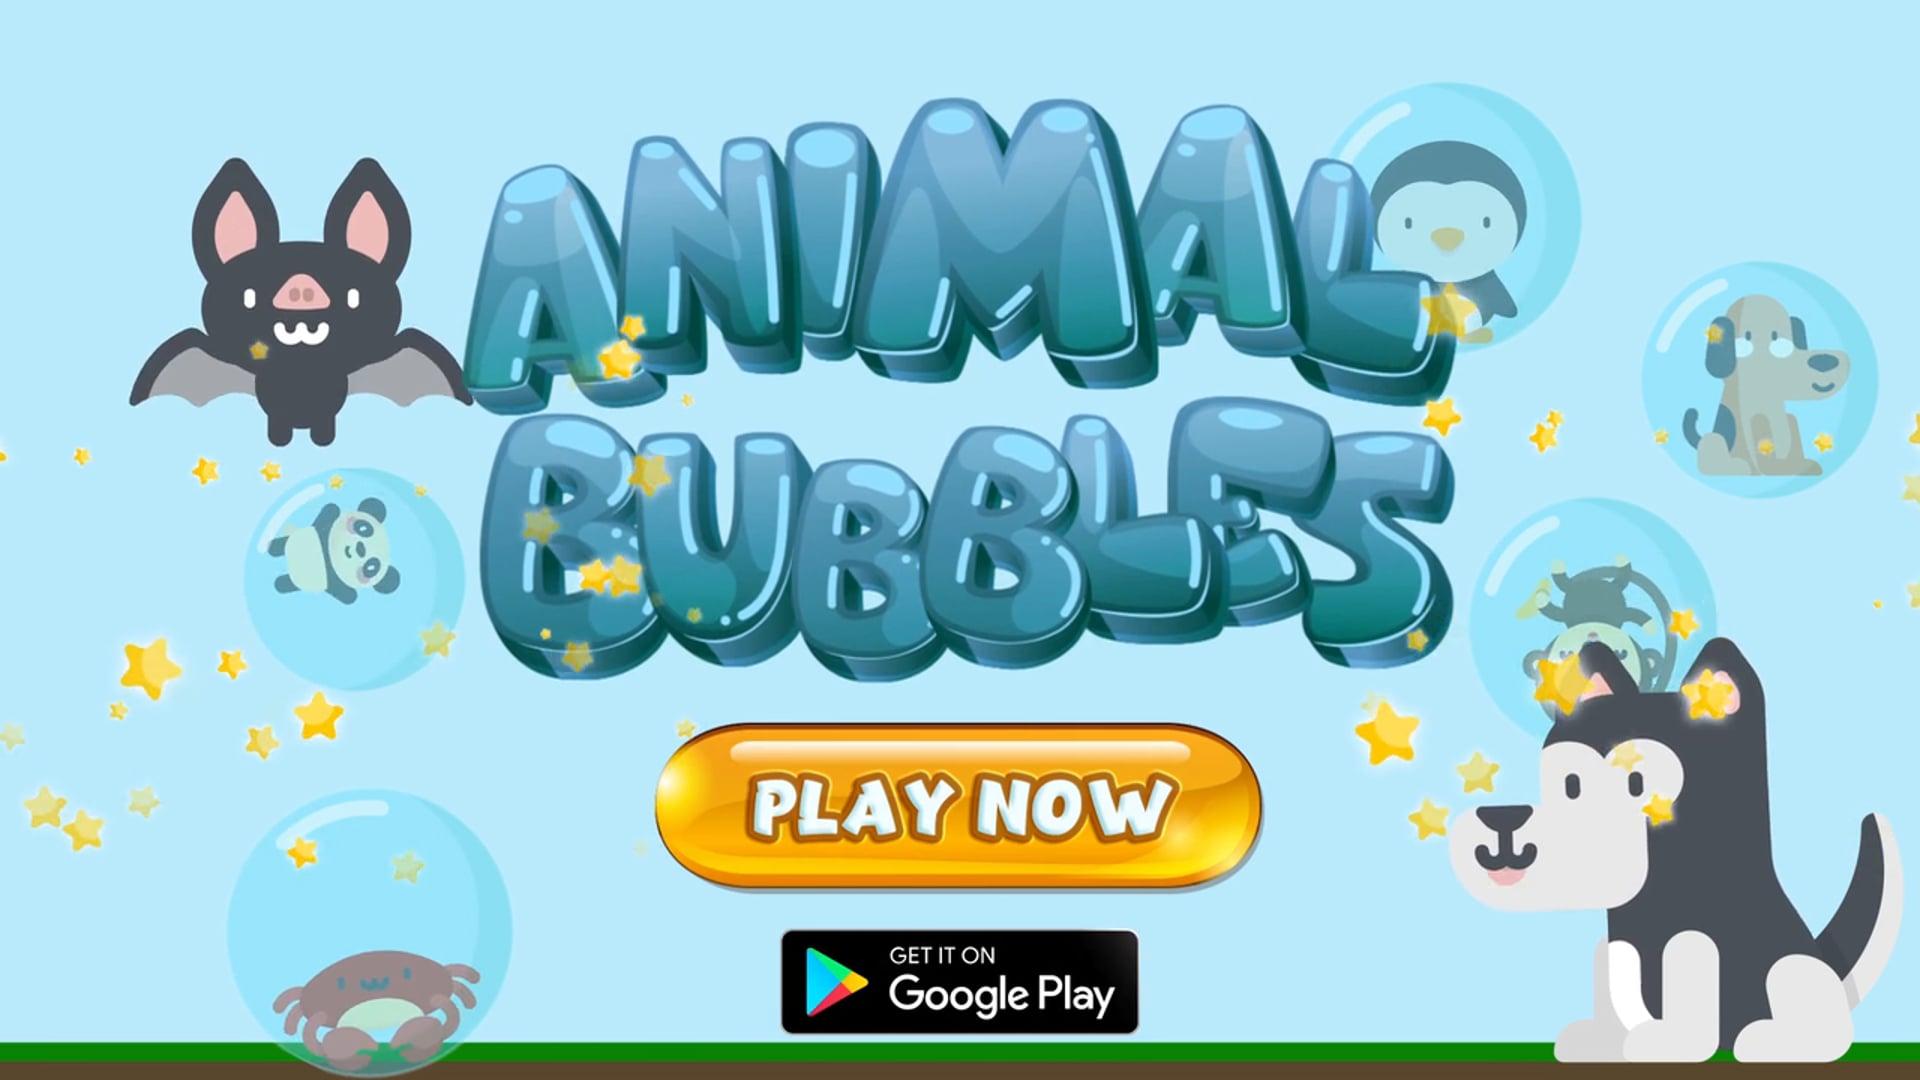 AnimalBubbles